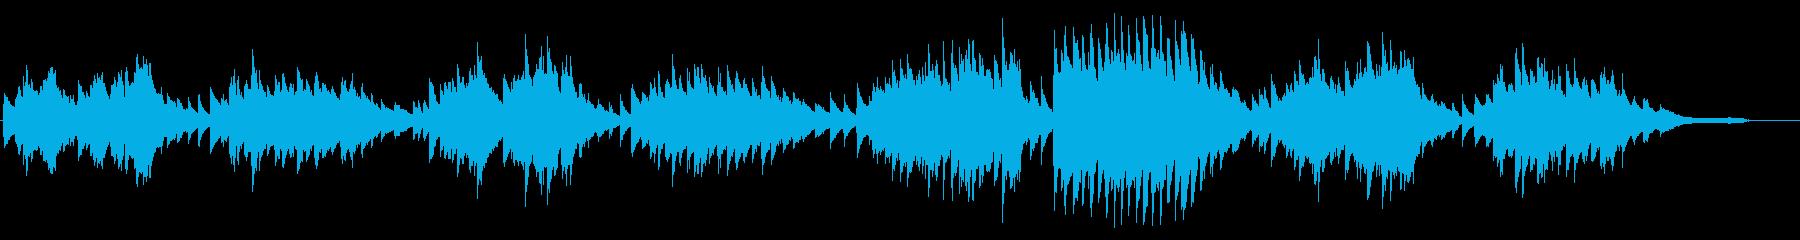 Chopinata Waltzの再生済みの波形